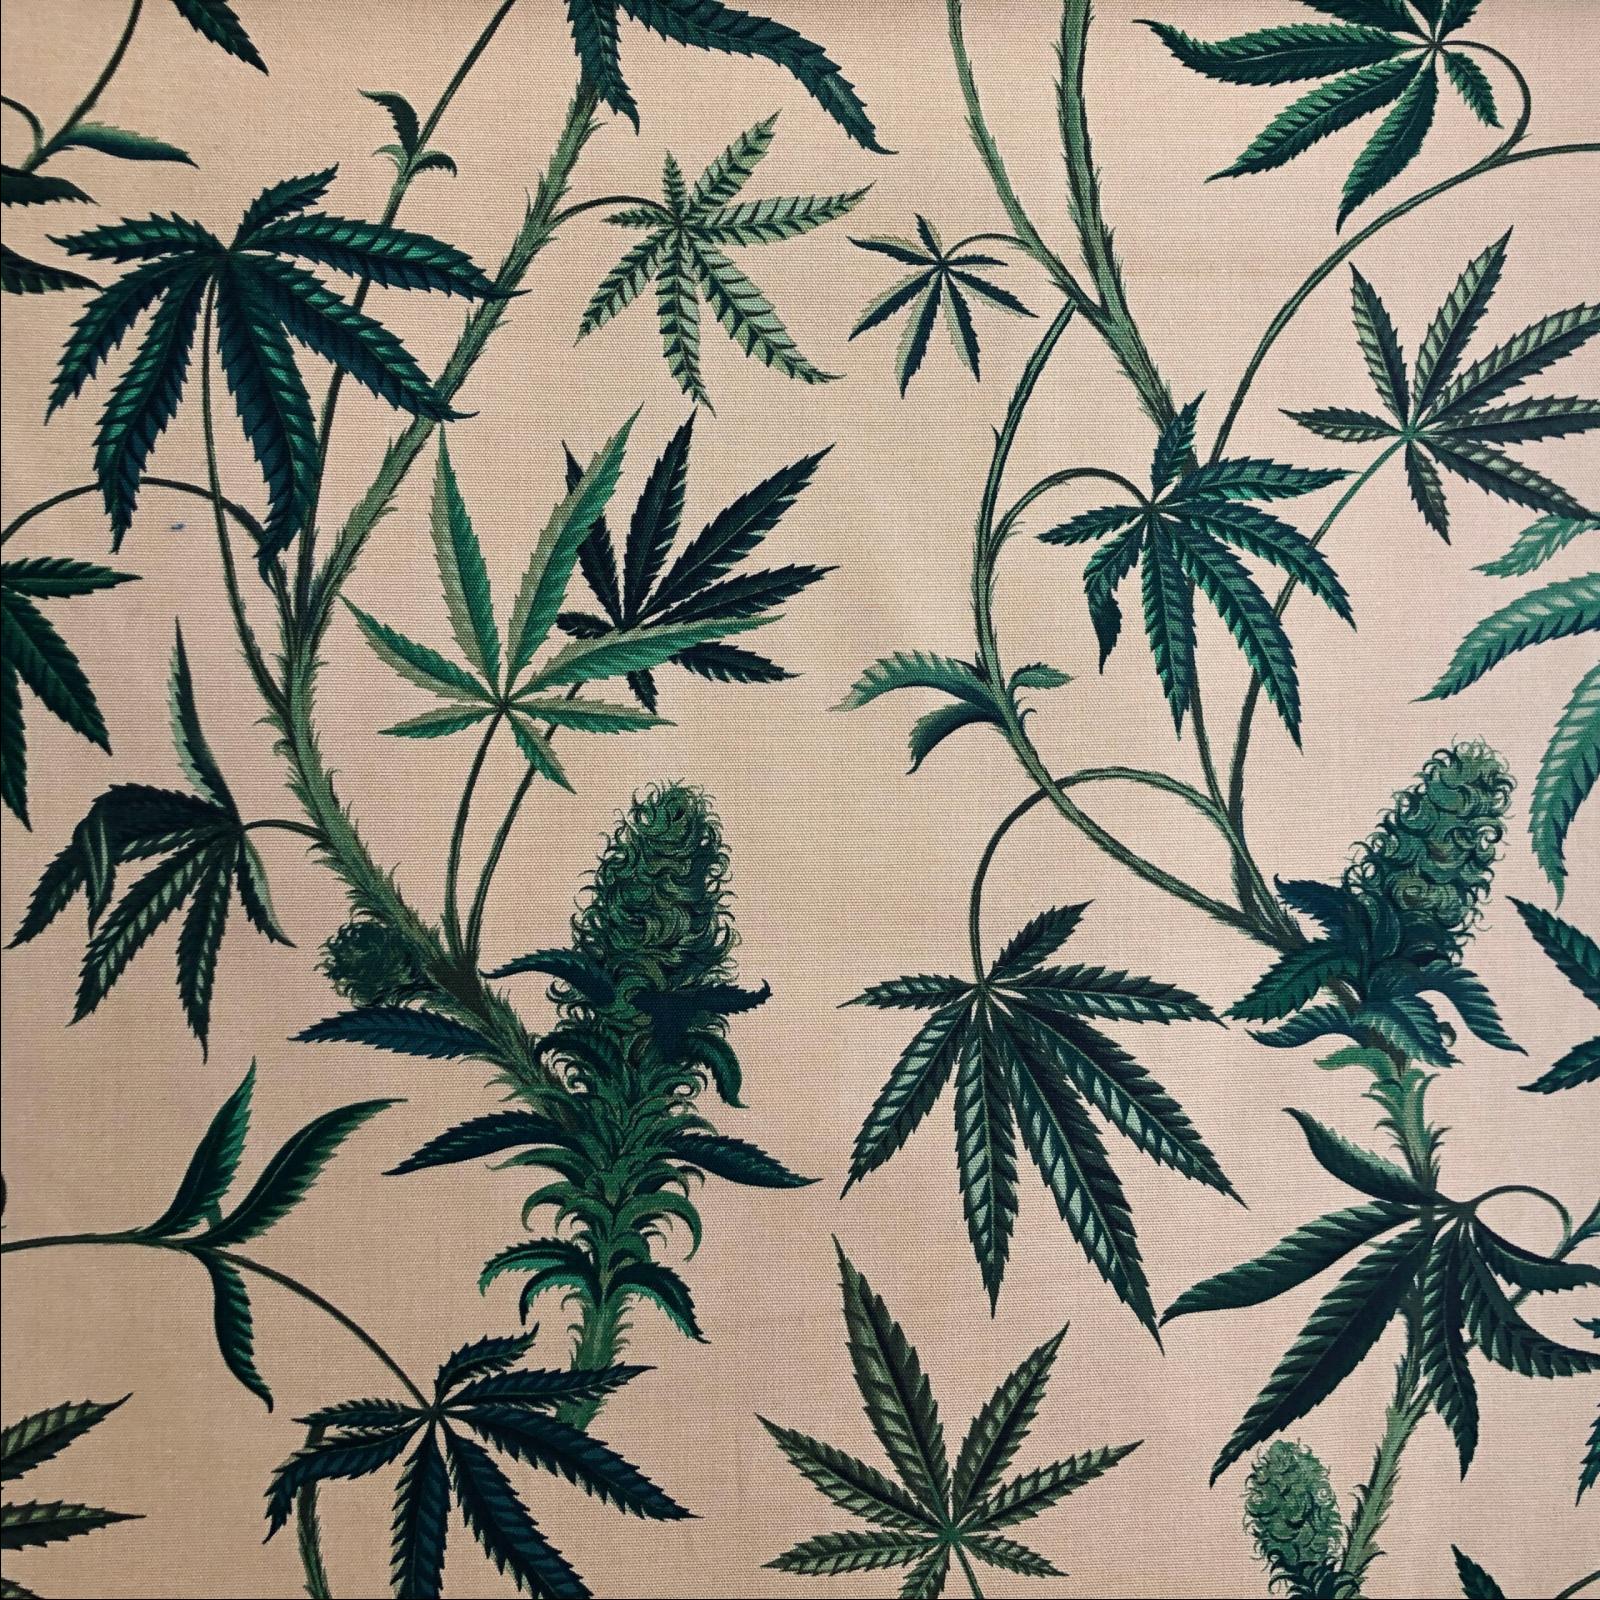 Alexander Henry Cannabis Cotton Canvas - Tan